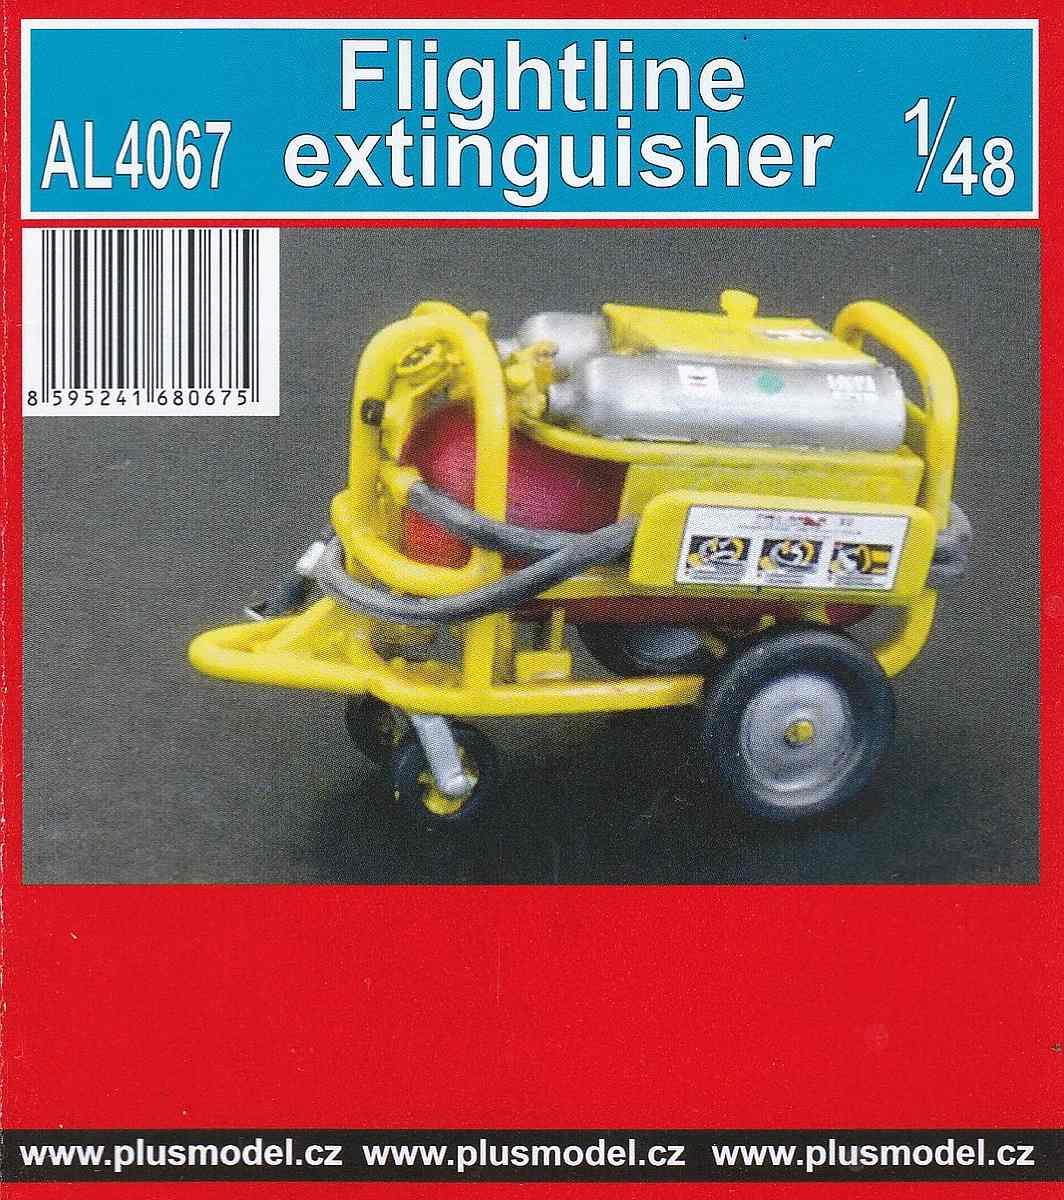 PlusMOdel-AL-4067-Flightline-Extinguisher-1 Flightline Extinguisher im Maßstab 1:48 von PlusModel AL 4067